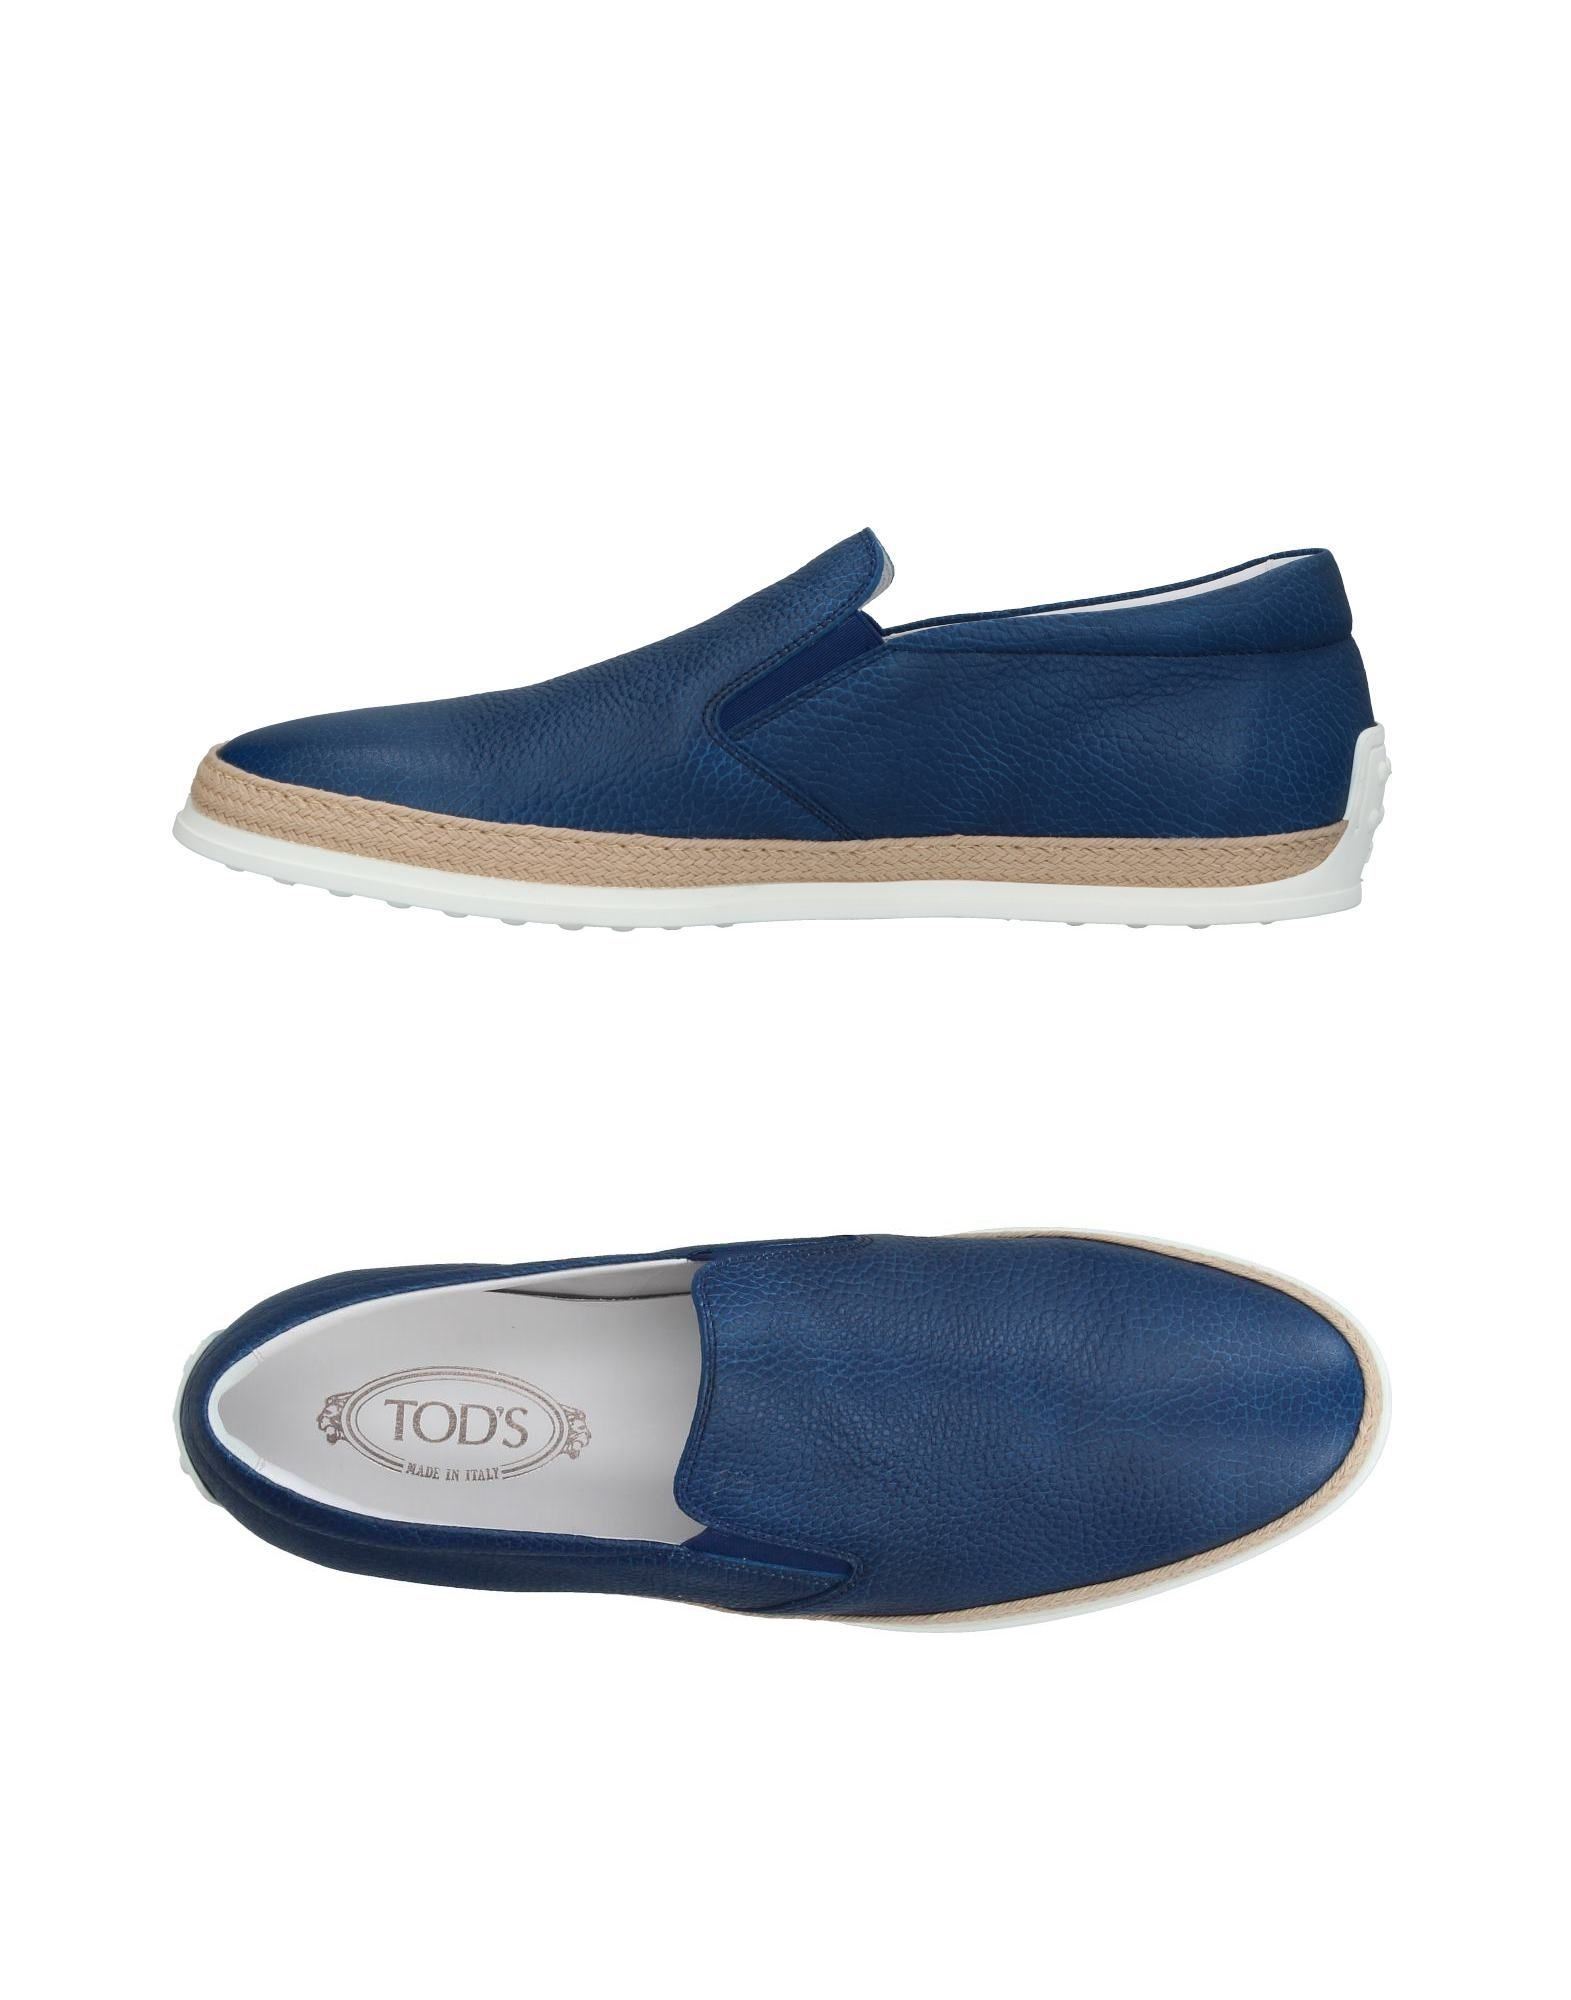 Tod's Mokassins Herren  11190499KQ Gute Qualität beliebte Schuhe